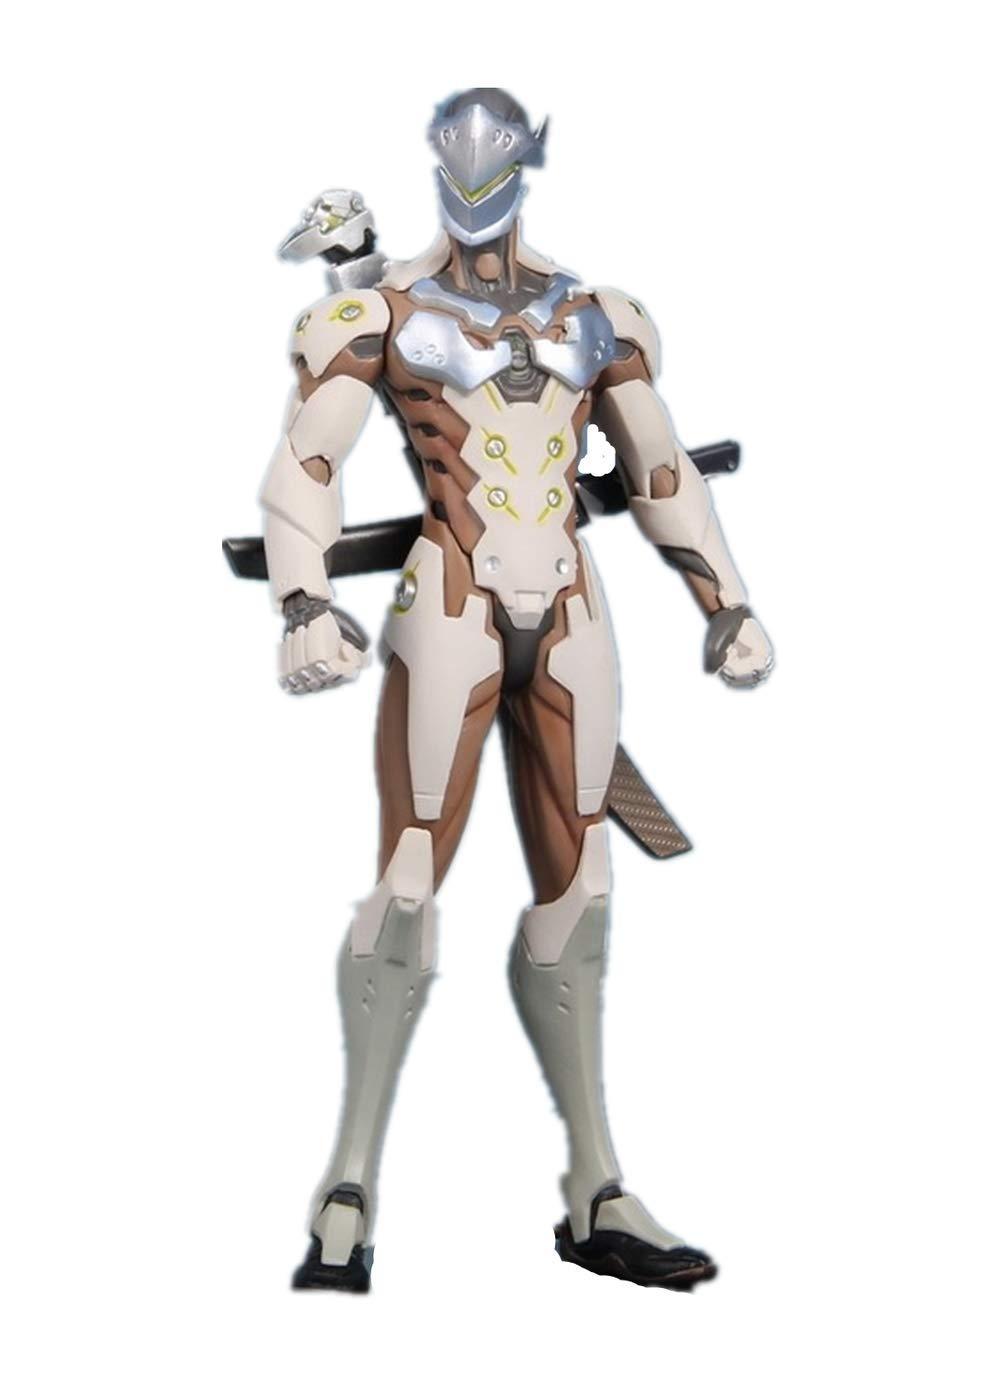 Amazon.com : 25cm PVC Anime Action Figure Genji with Sword ...